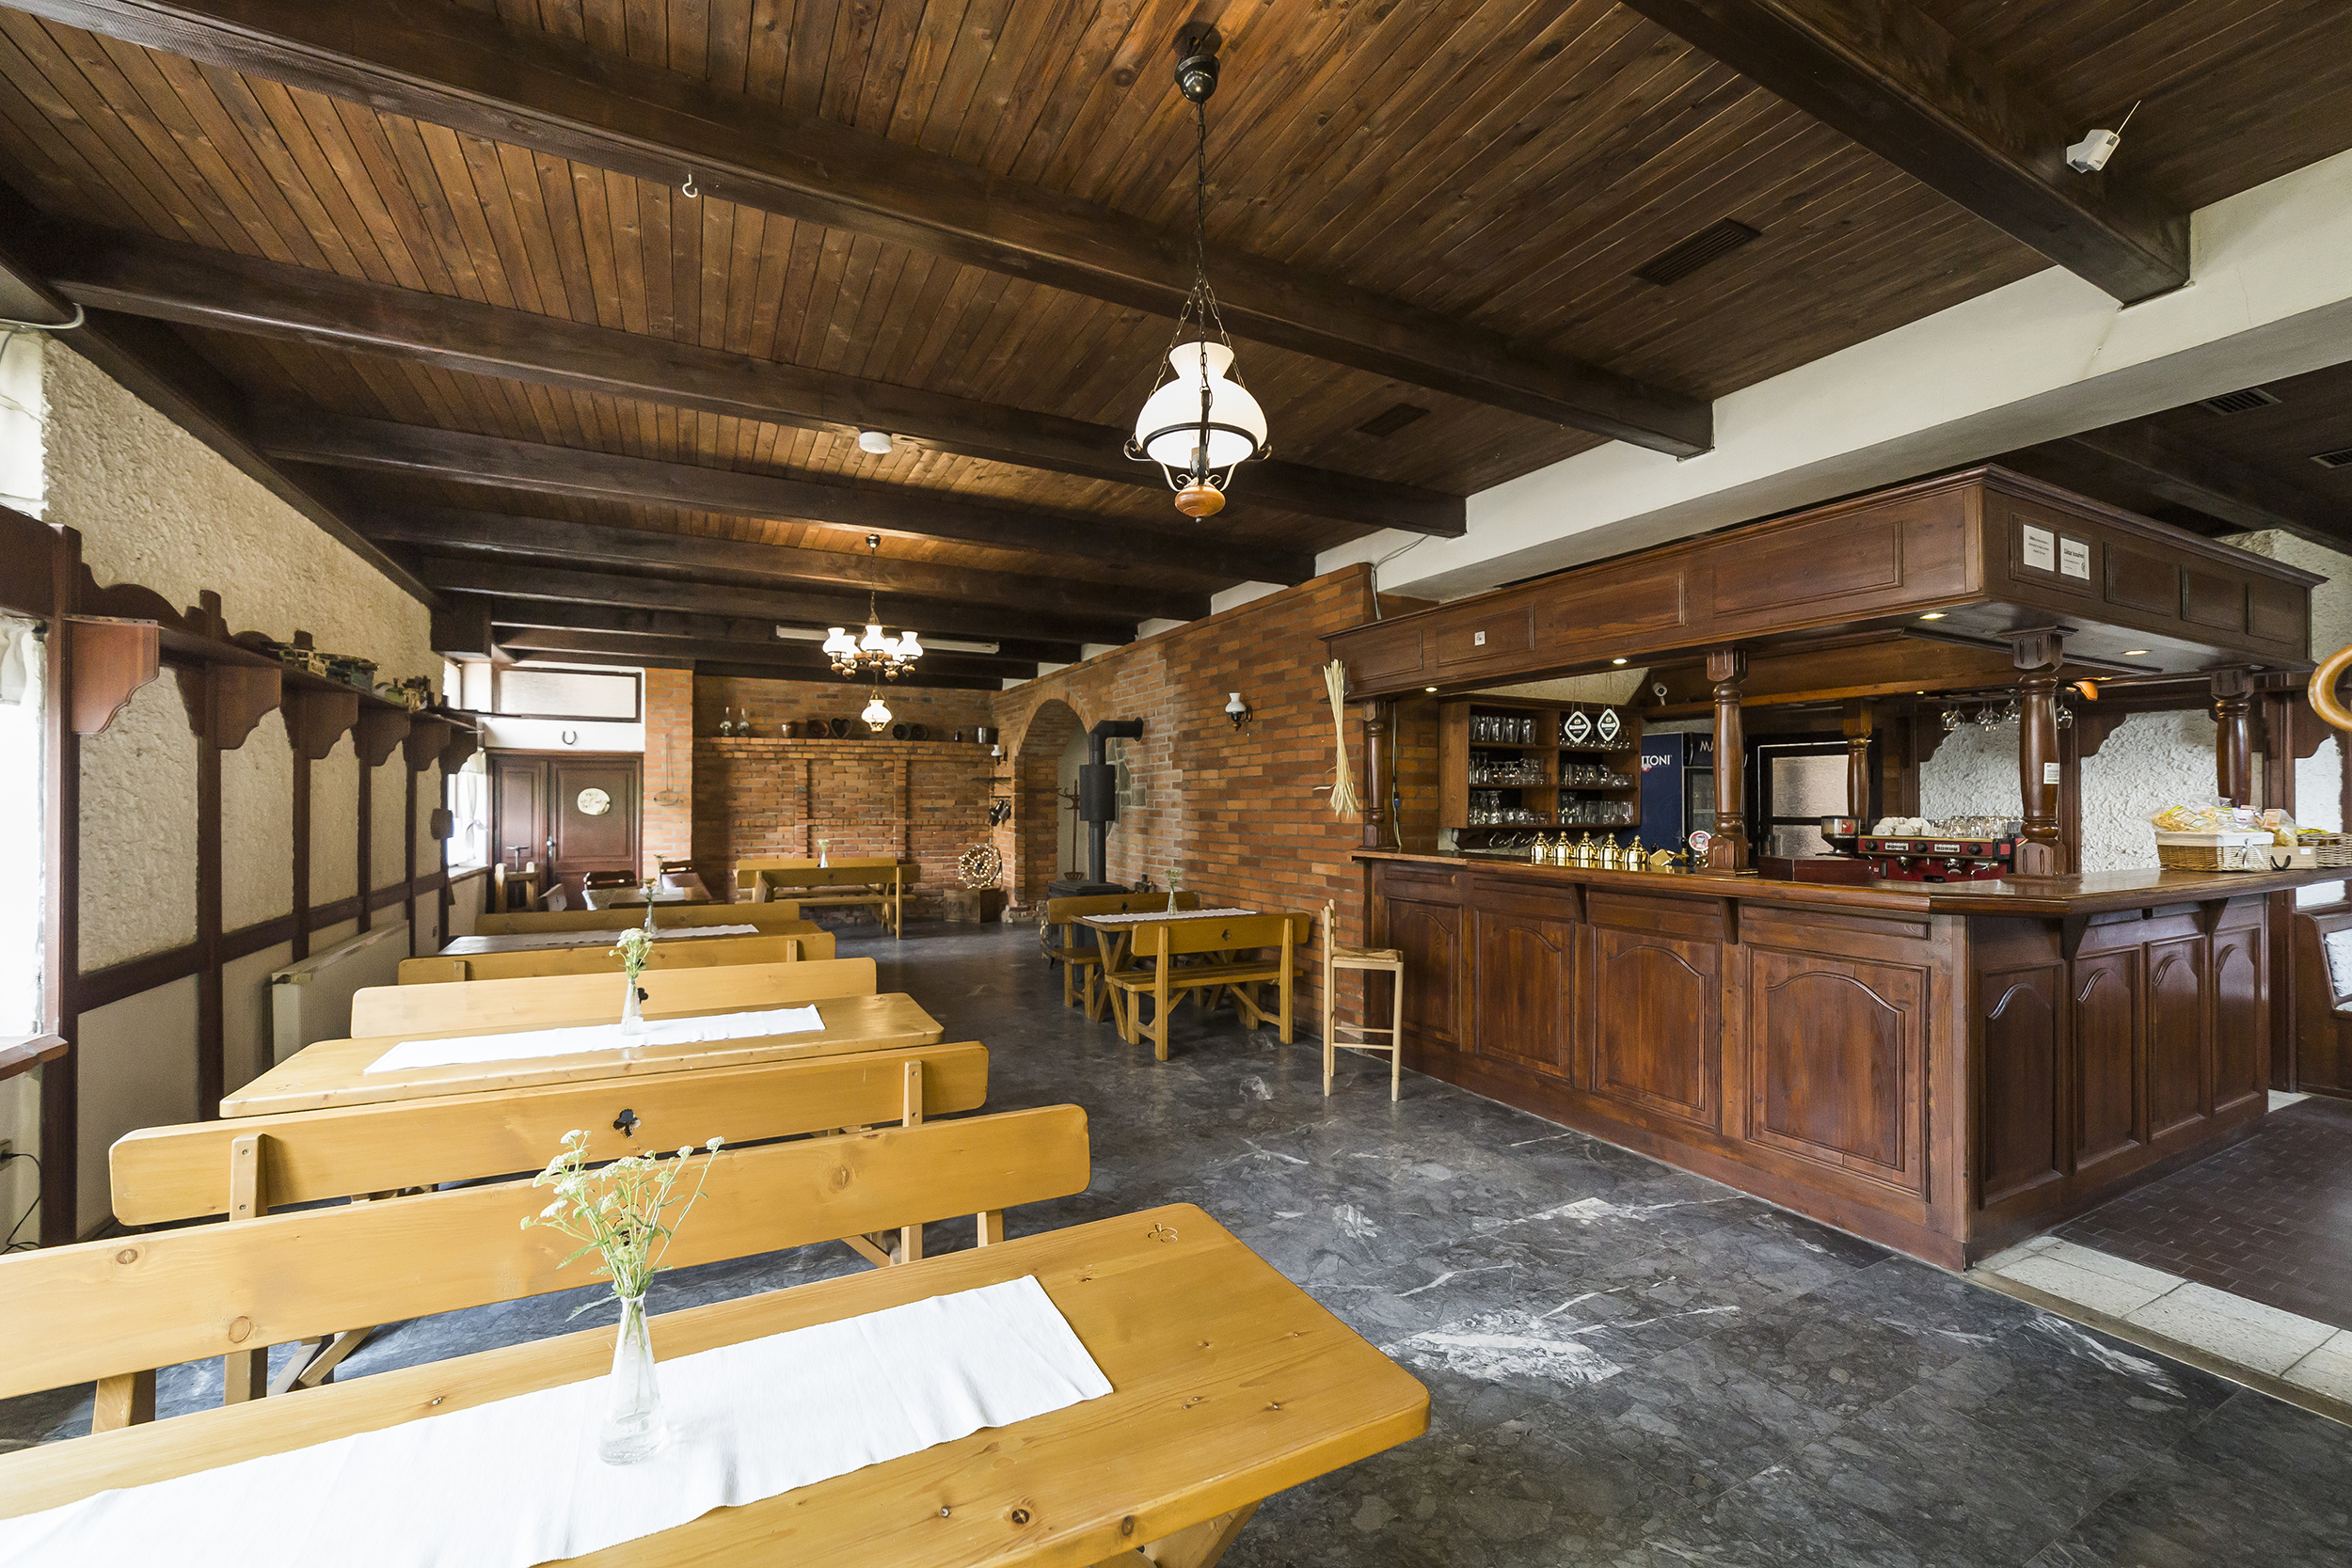 restaurace radunka radun ubrus stul lavice bar strop linda bittova